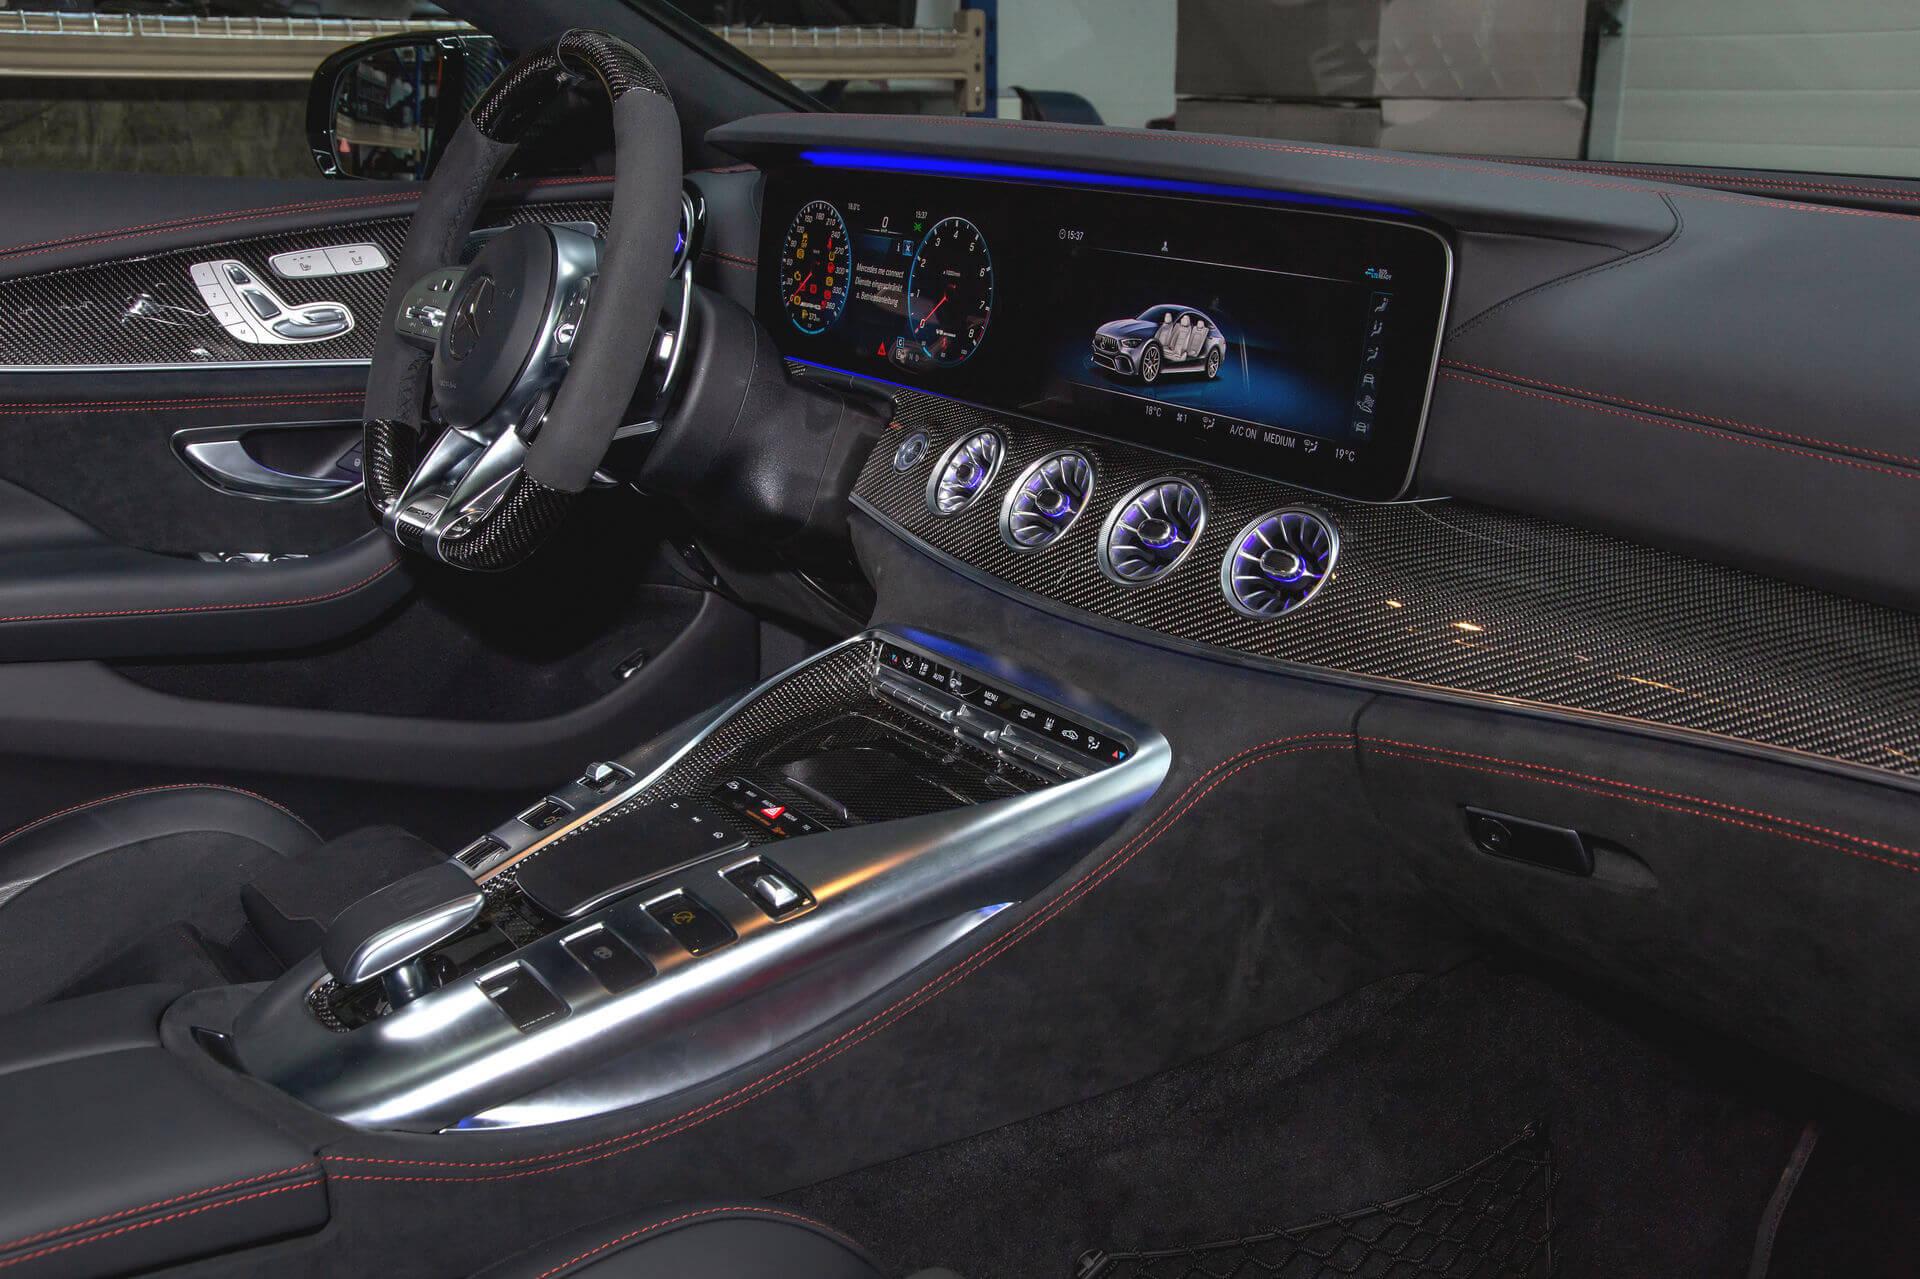 Posaidon Mercedes-AMG GT 4 portes